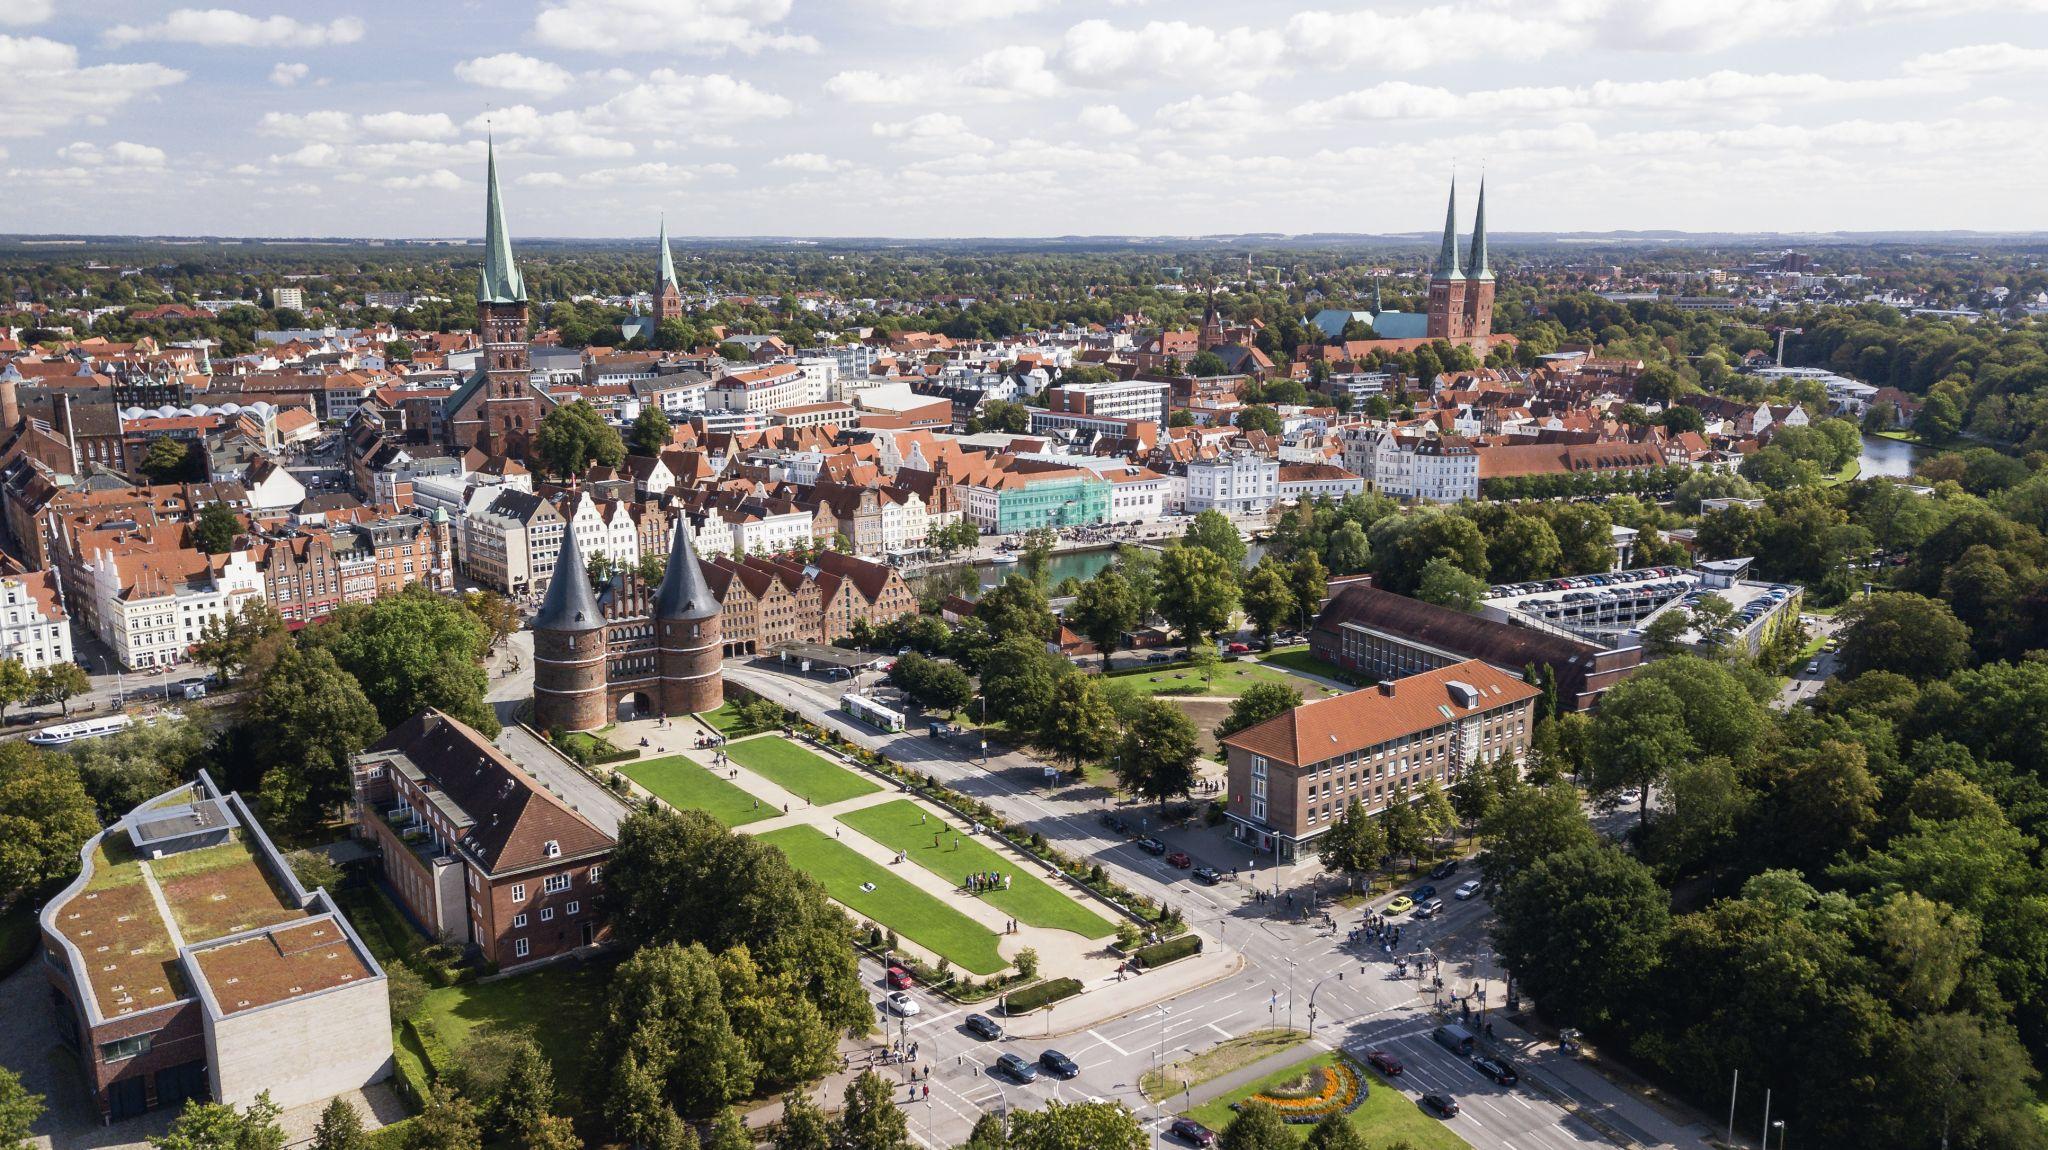 Lubeck gate, lubeck, Germany, Germany